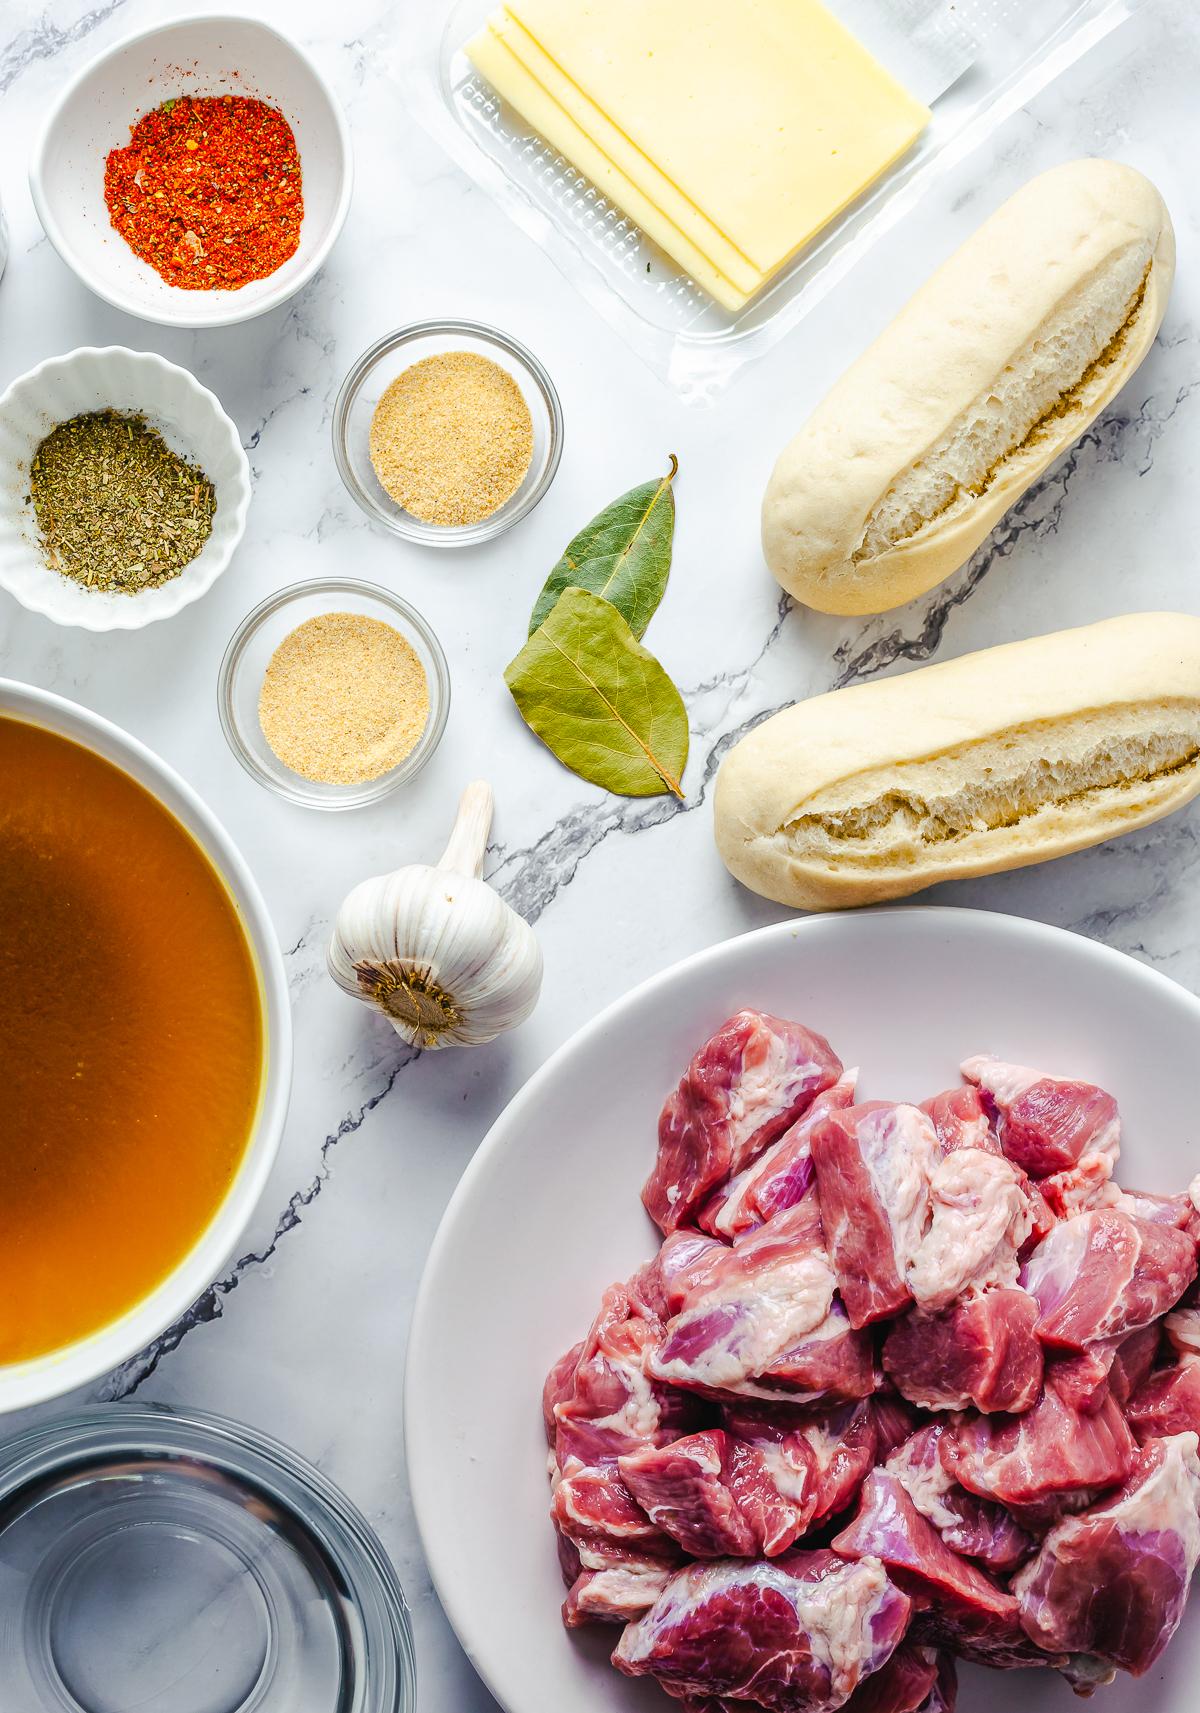 Ingredients to make a Crock Pot French Dip.